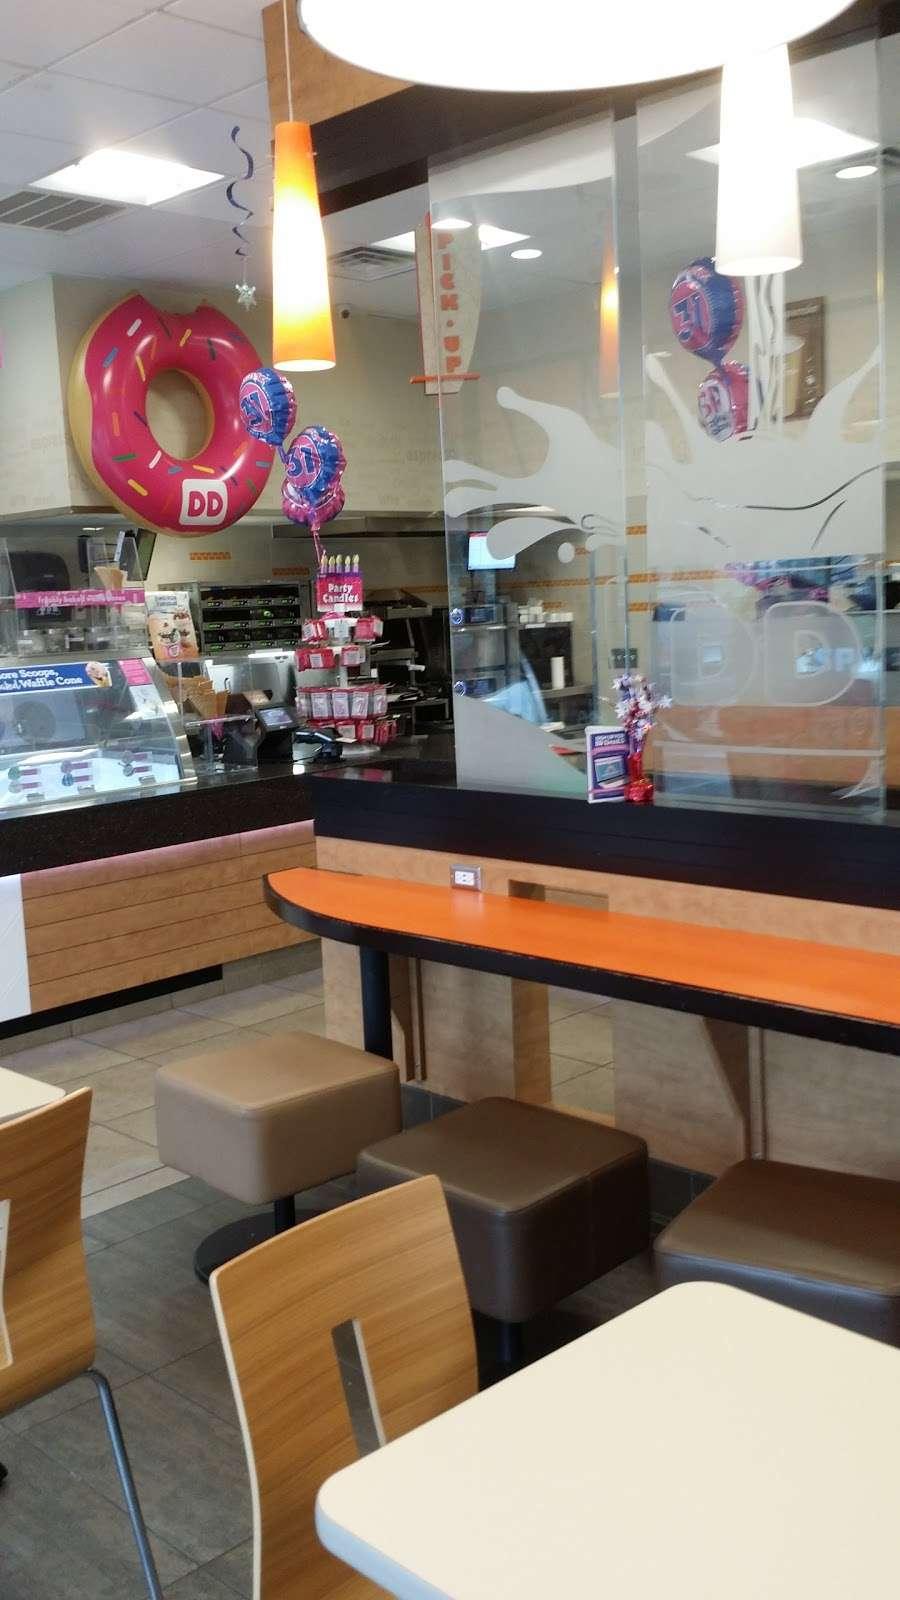 Dunkin Donuts - cafe  | Photo 9 of 10 | Address: 699 Avalon Drive, Wood-Ridge, NJ 07075, USA | Phone: (201) 203-1866